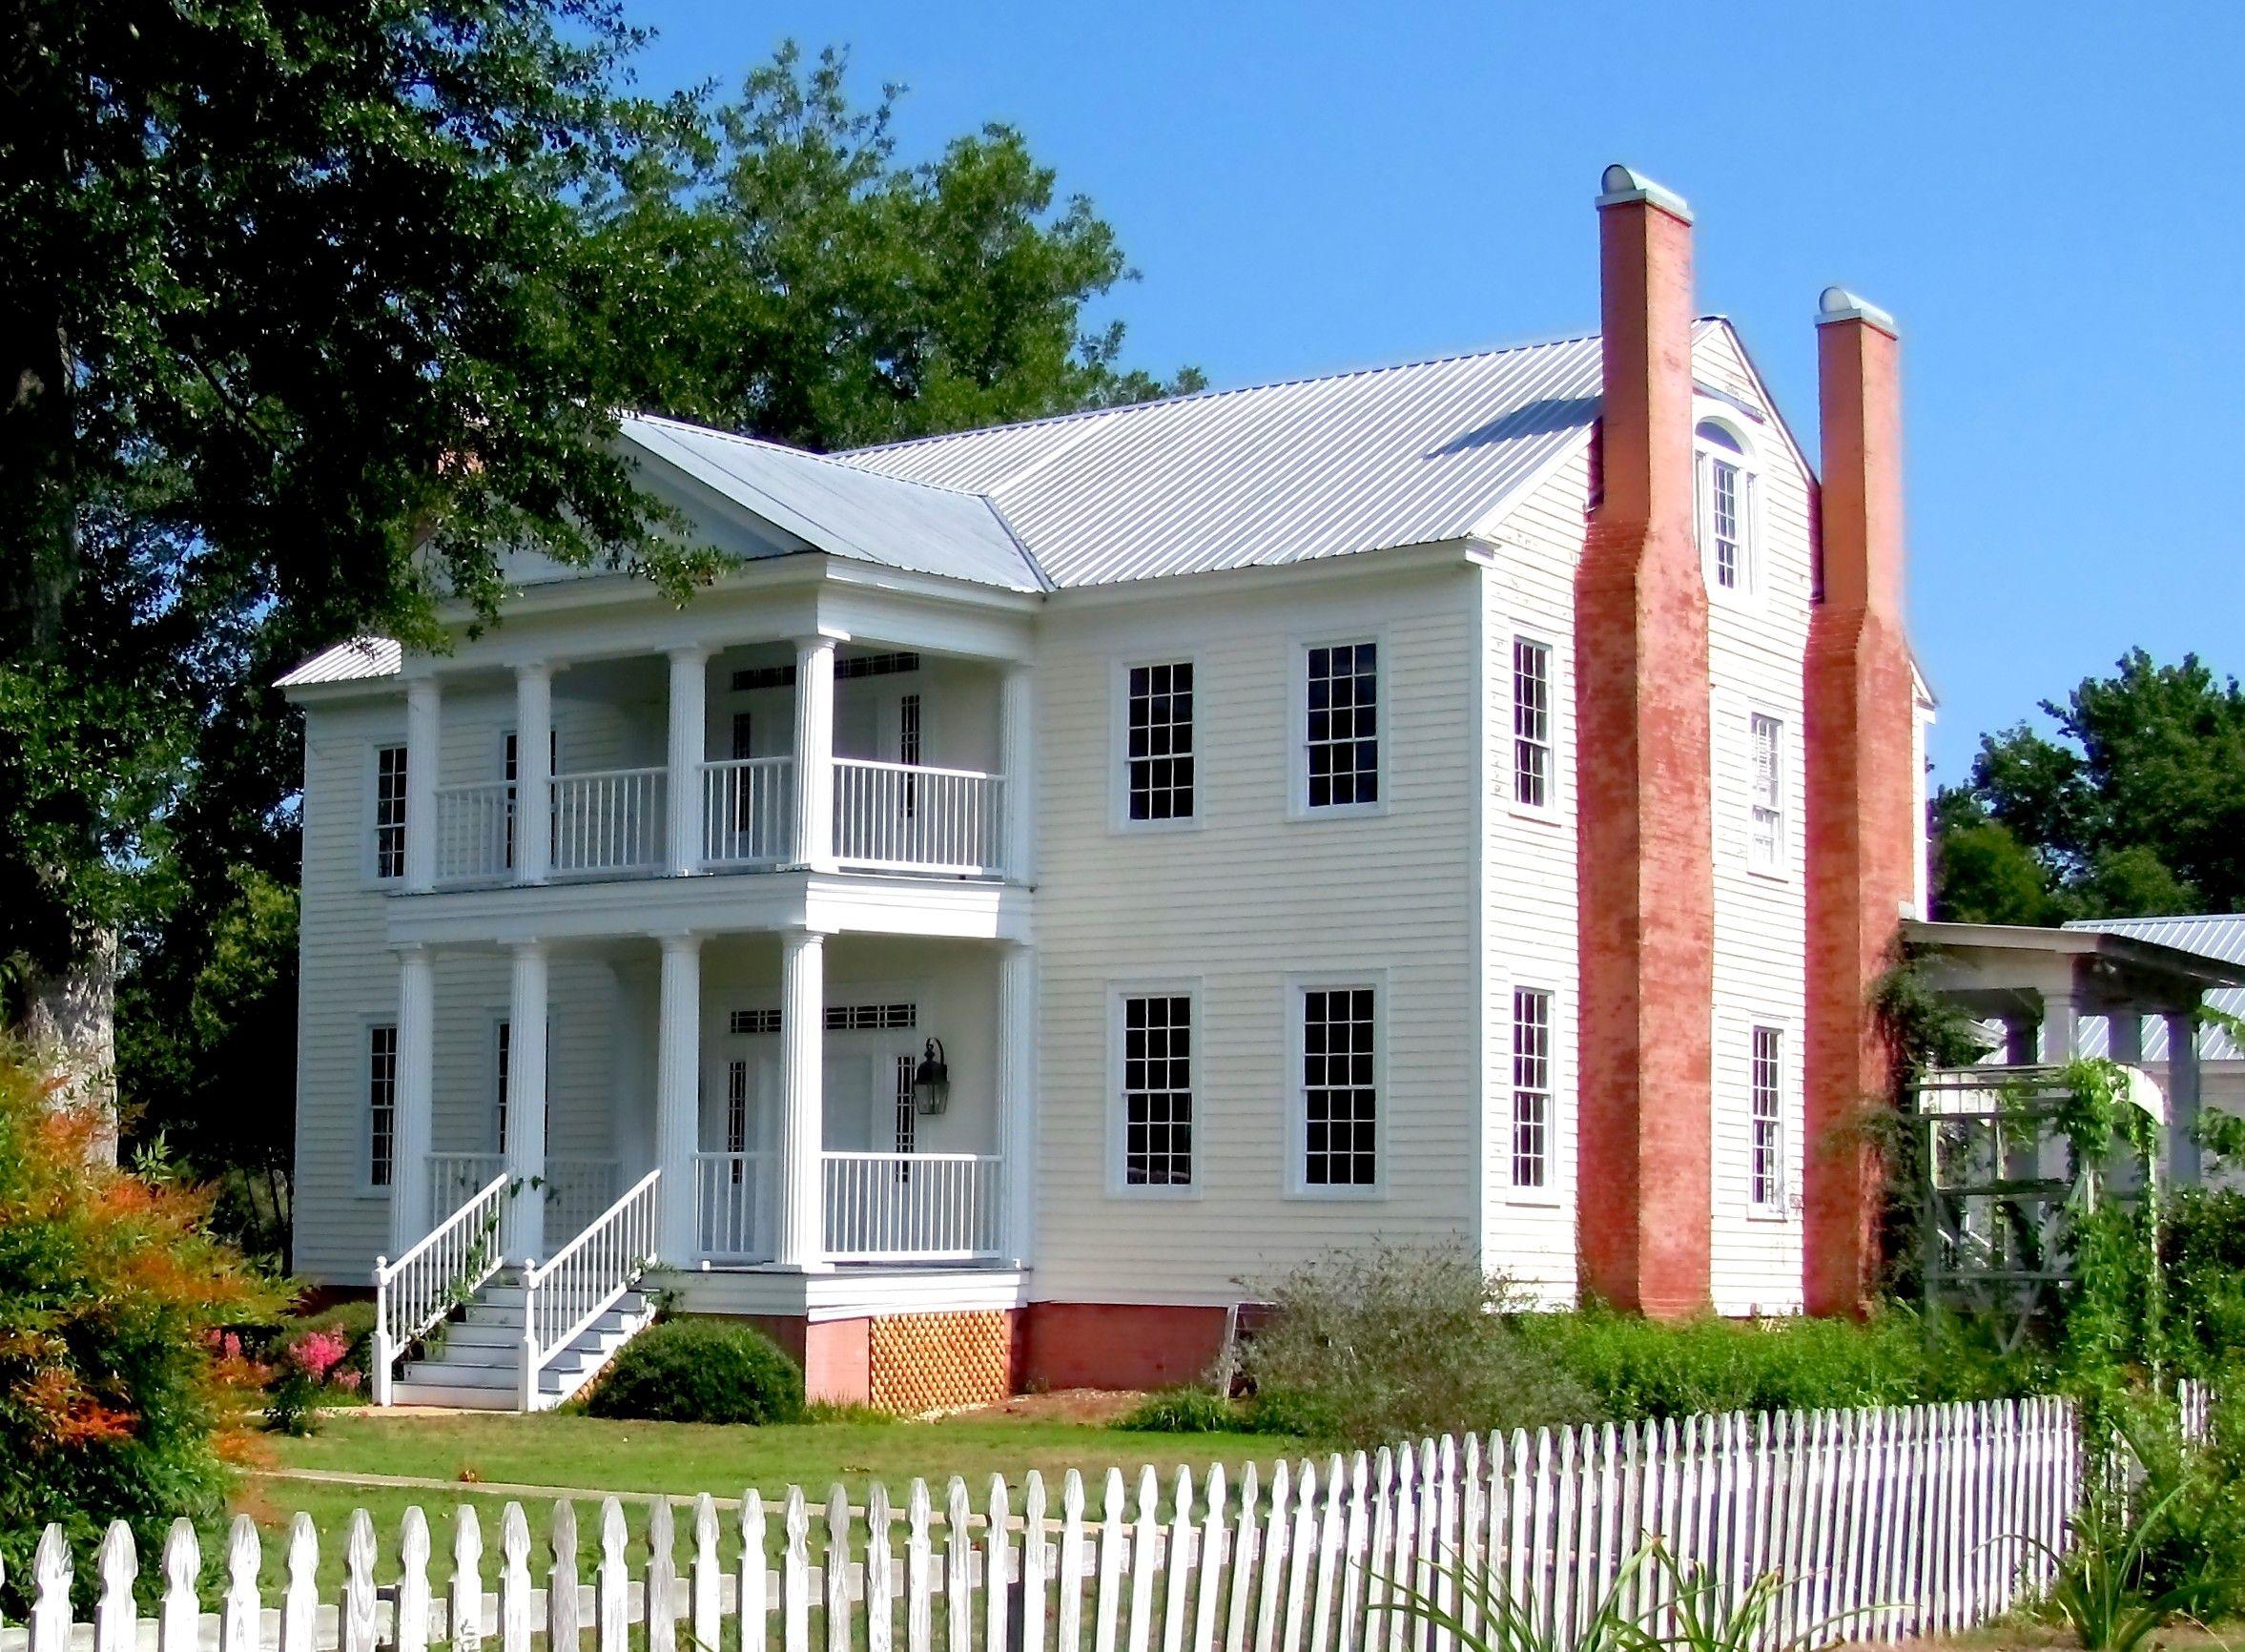 THe Underwood Plantation House in Pleasant Hill, Alabama